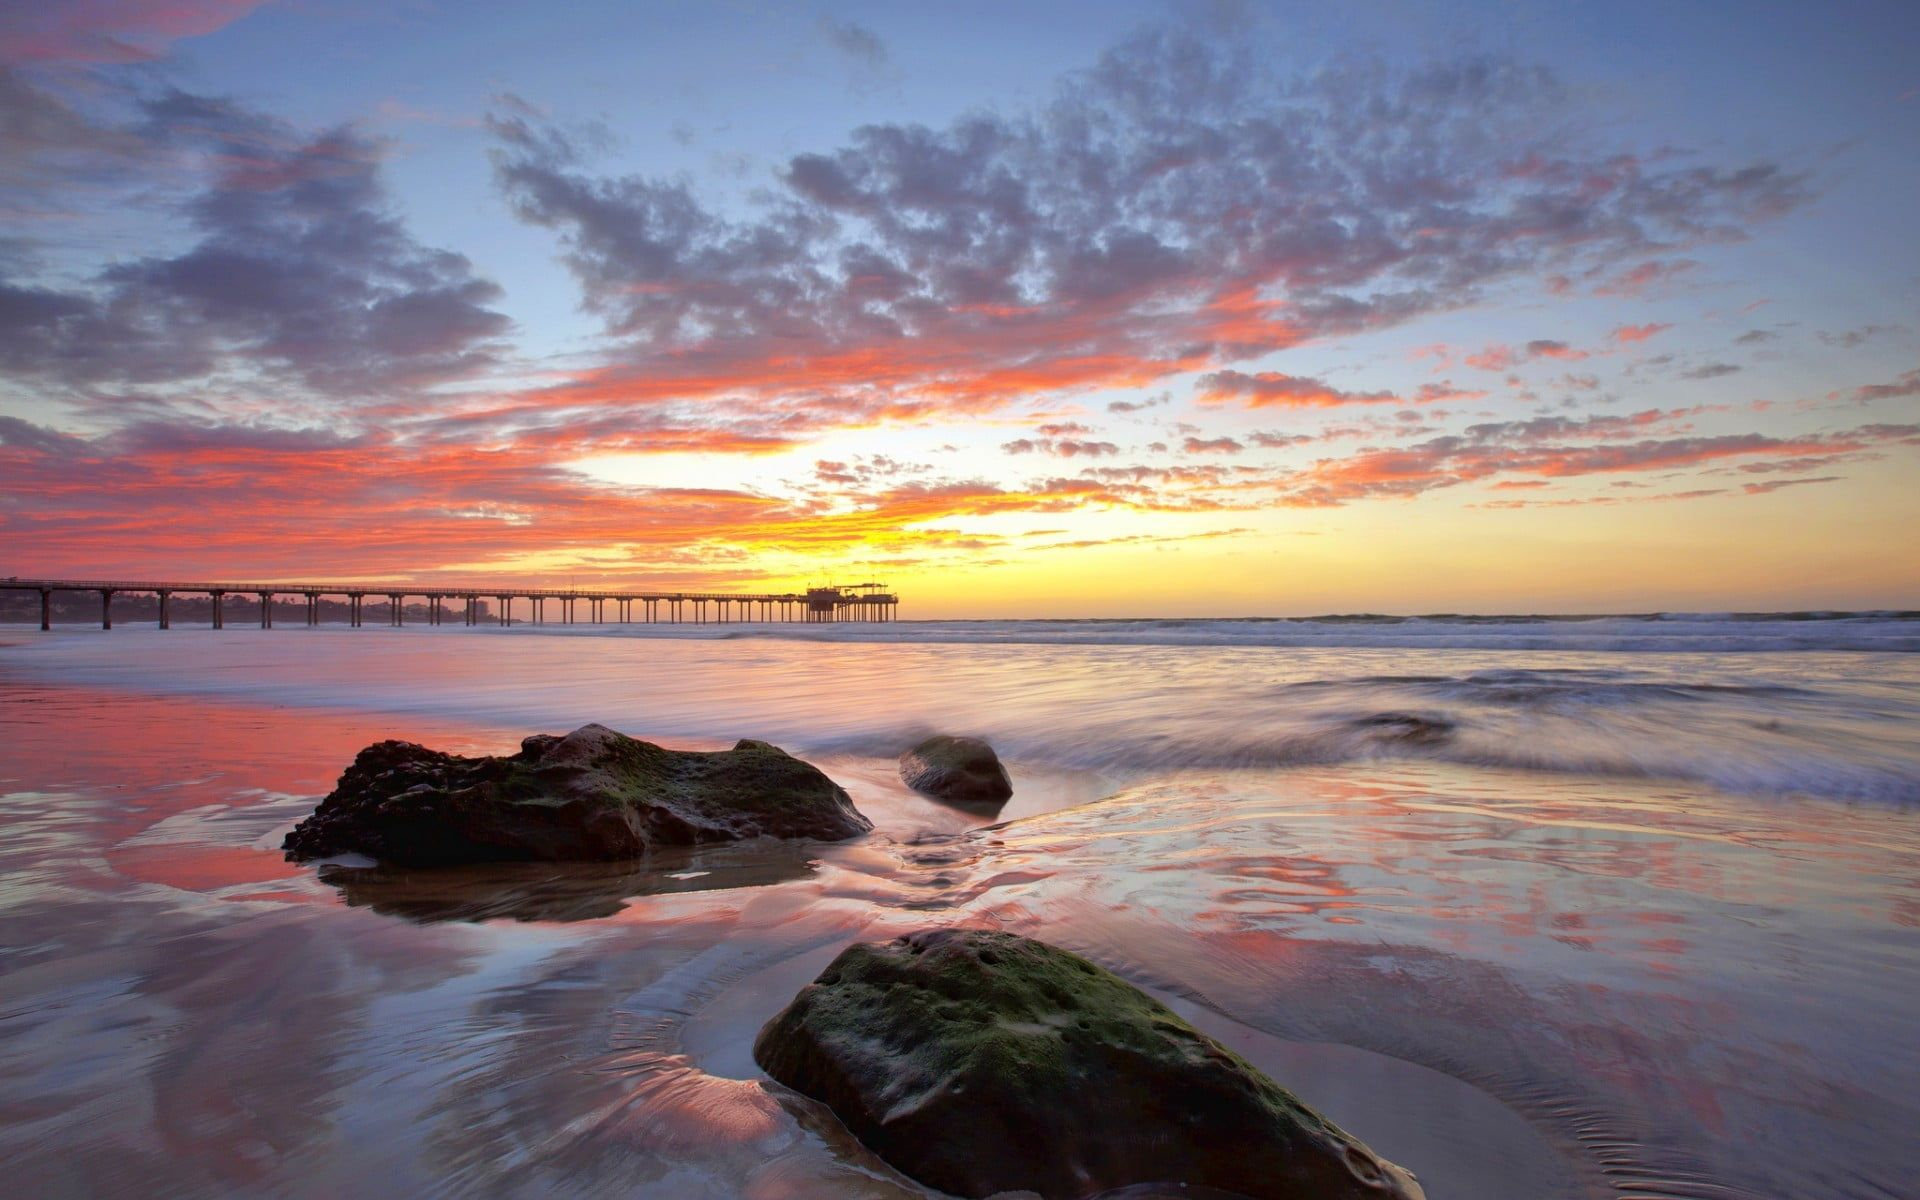 Rocks In Seashore During Golden Hour Beach Sky Horizon Pier Sea Sunlight 1080p Wallpaper Hdwallpa In 2021 Beach Sunset Wallpaper Sunset Wallpaper Hd Wallpaper Wallpaper sky clouds pier sea horizon